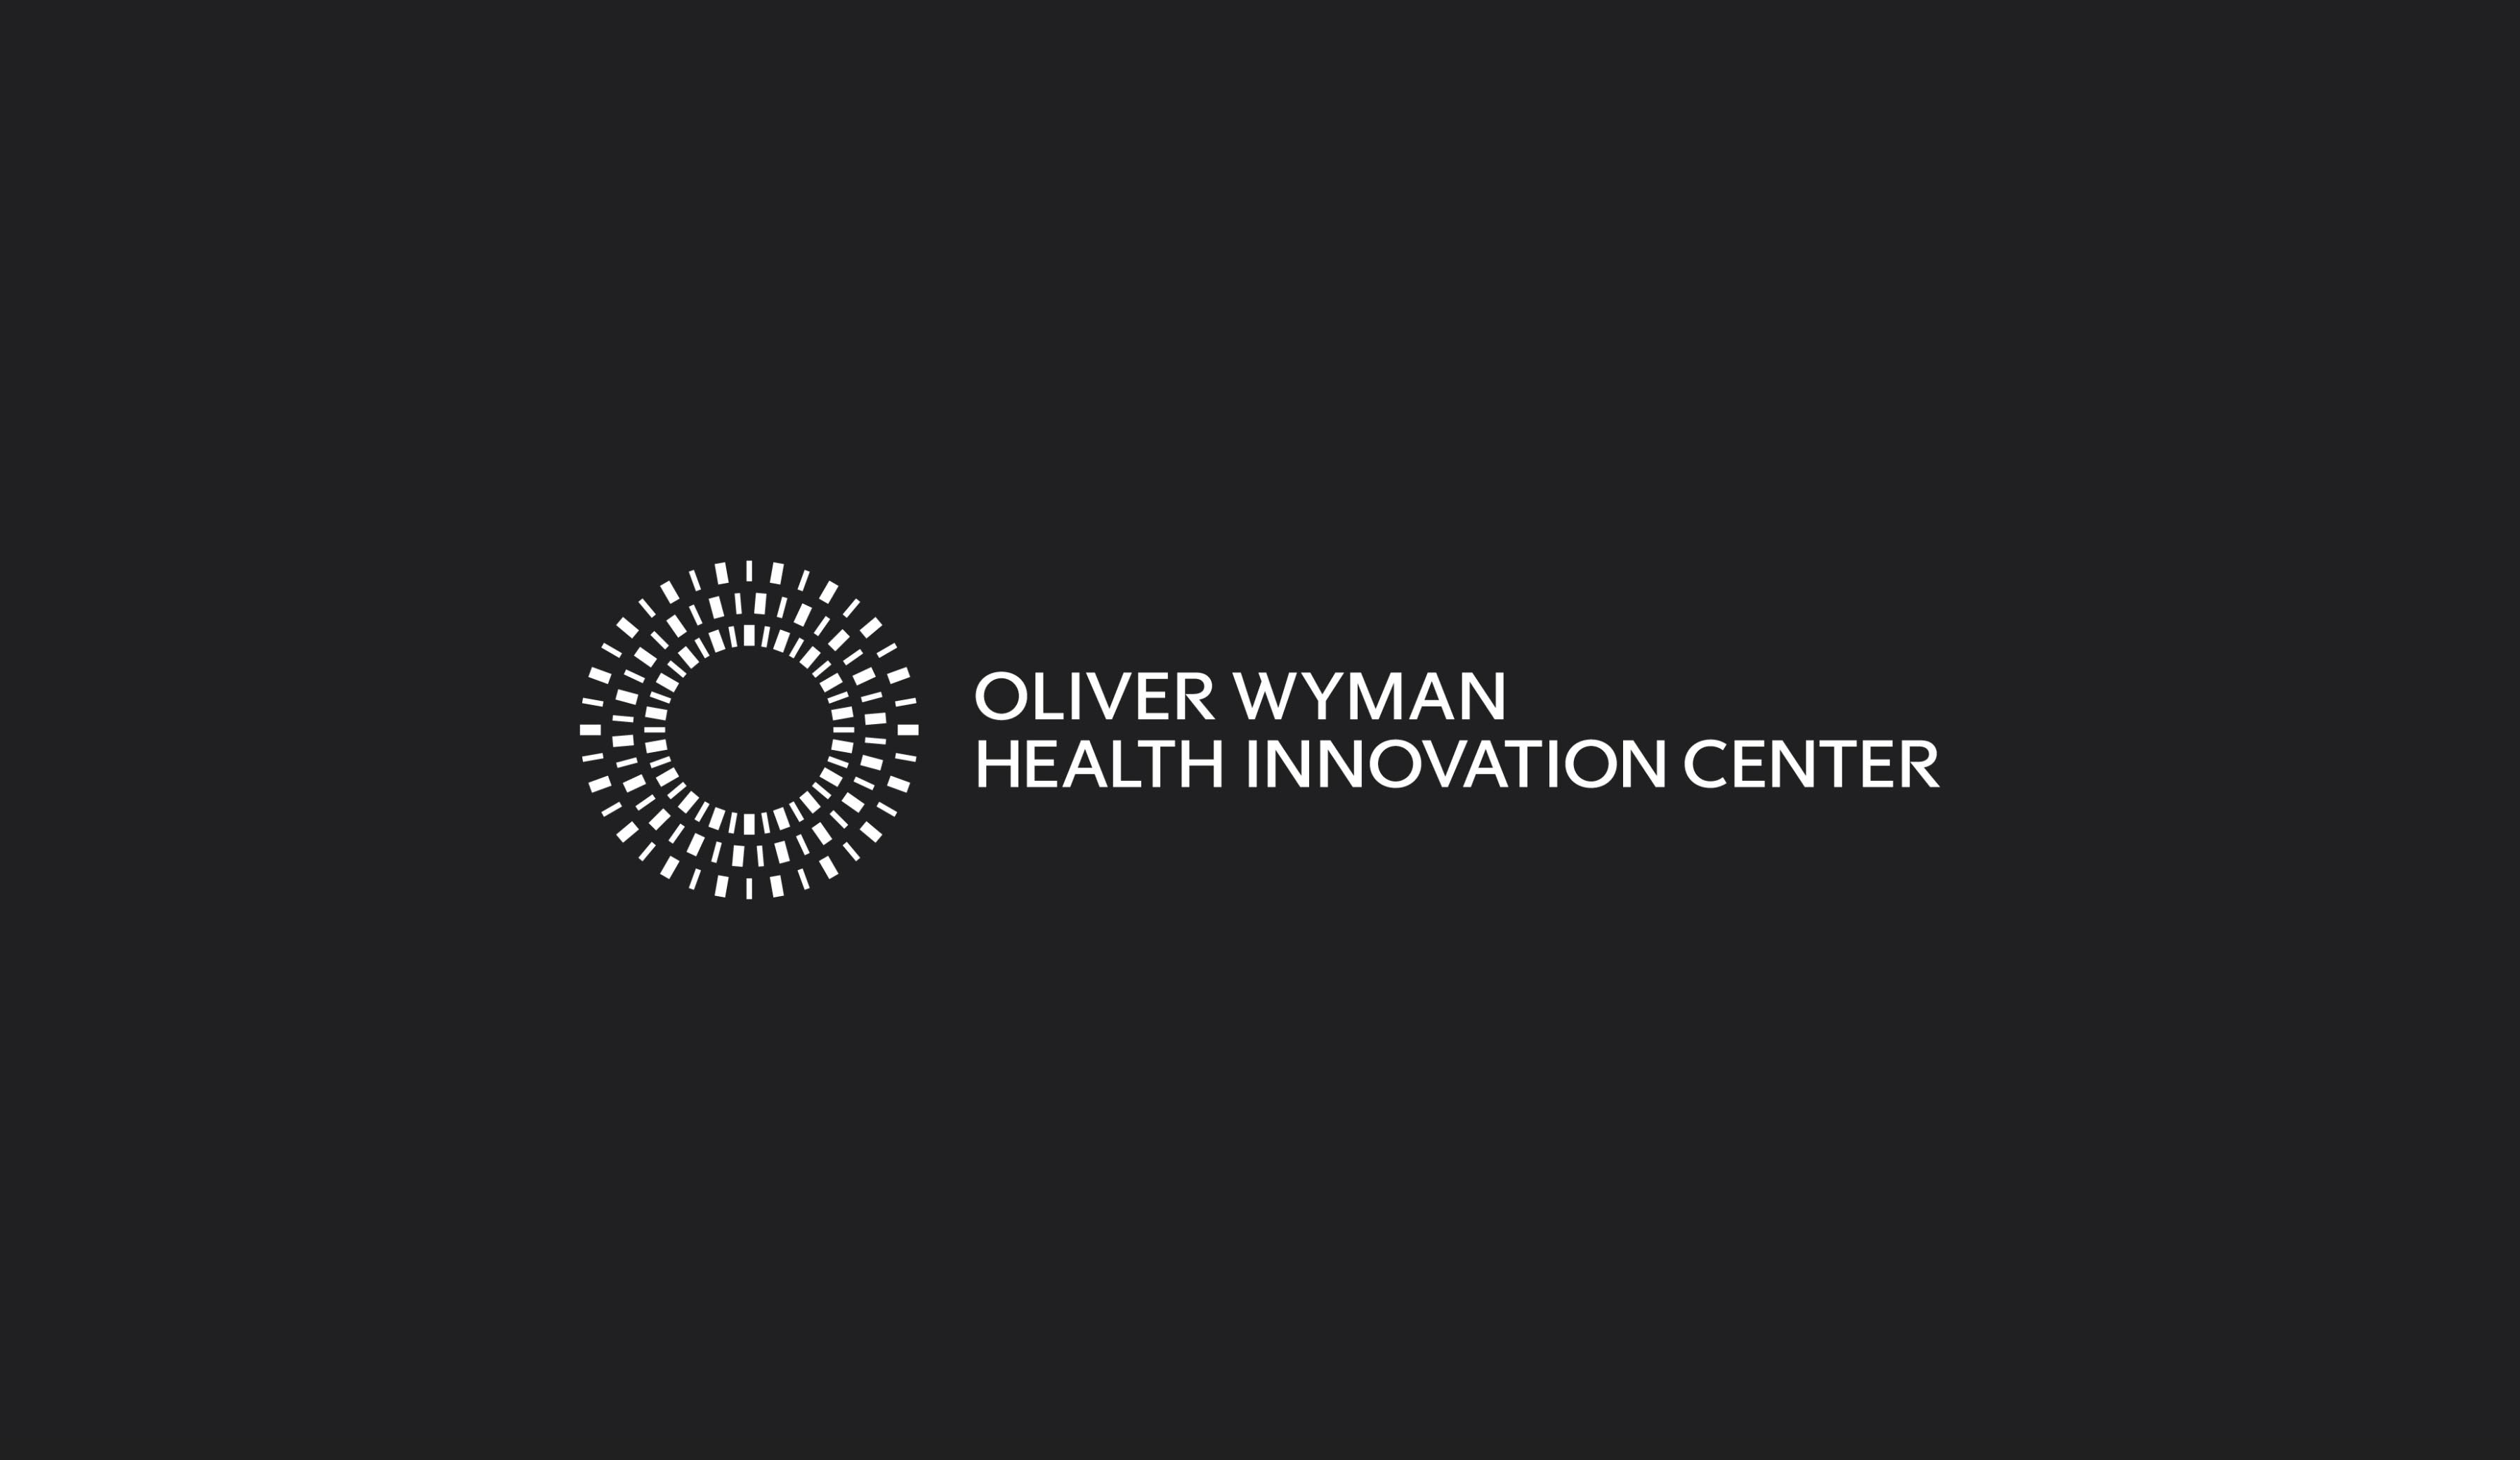 Oliver Wyman Health Innovation Center logo design